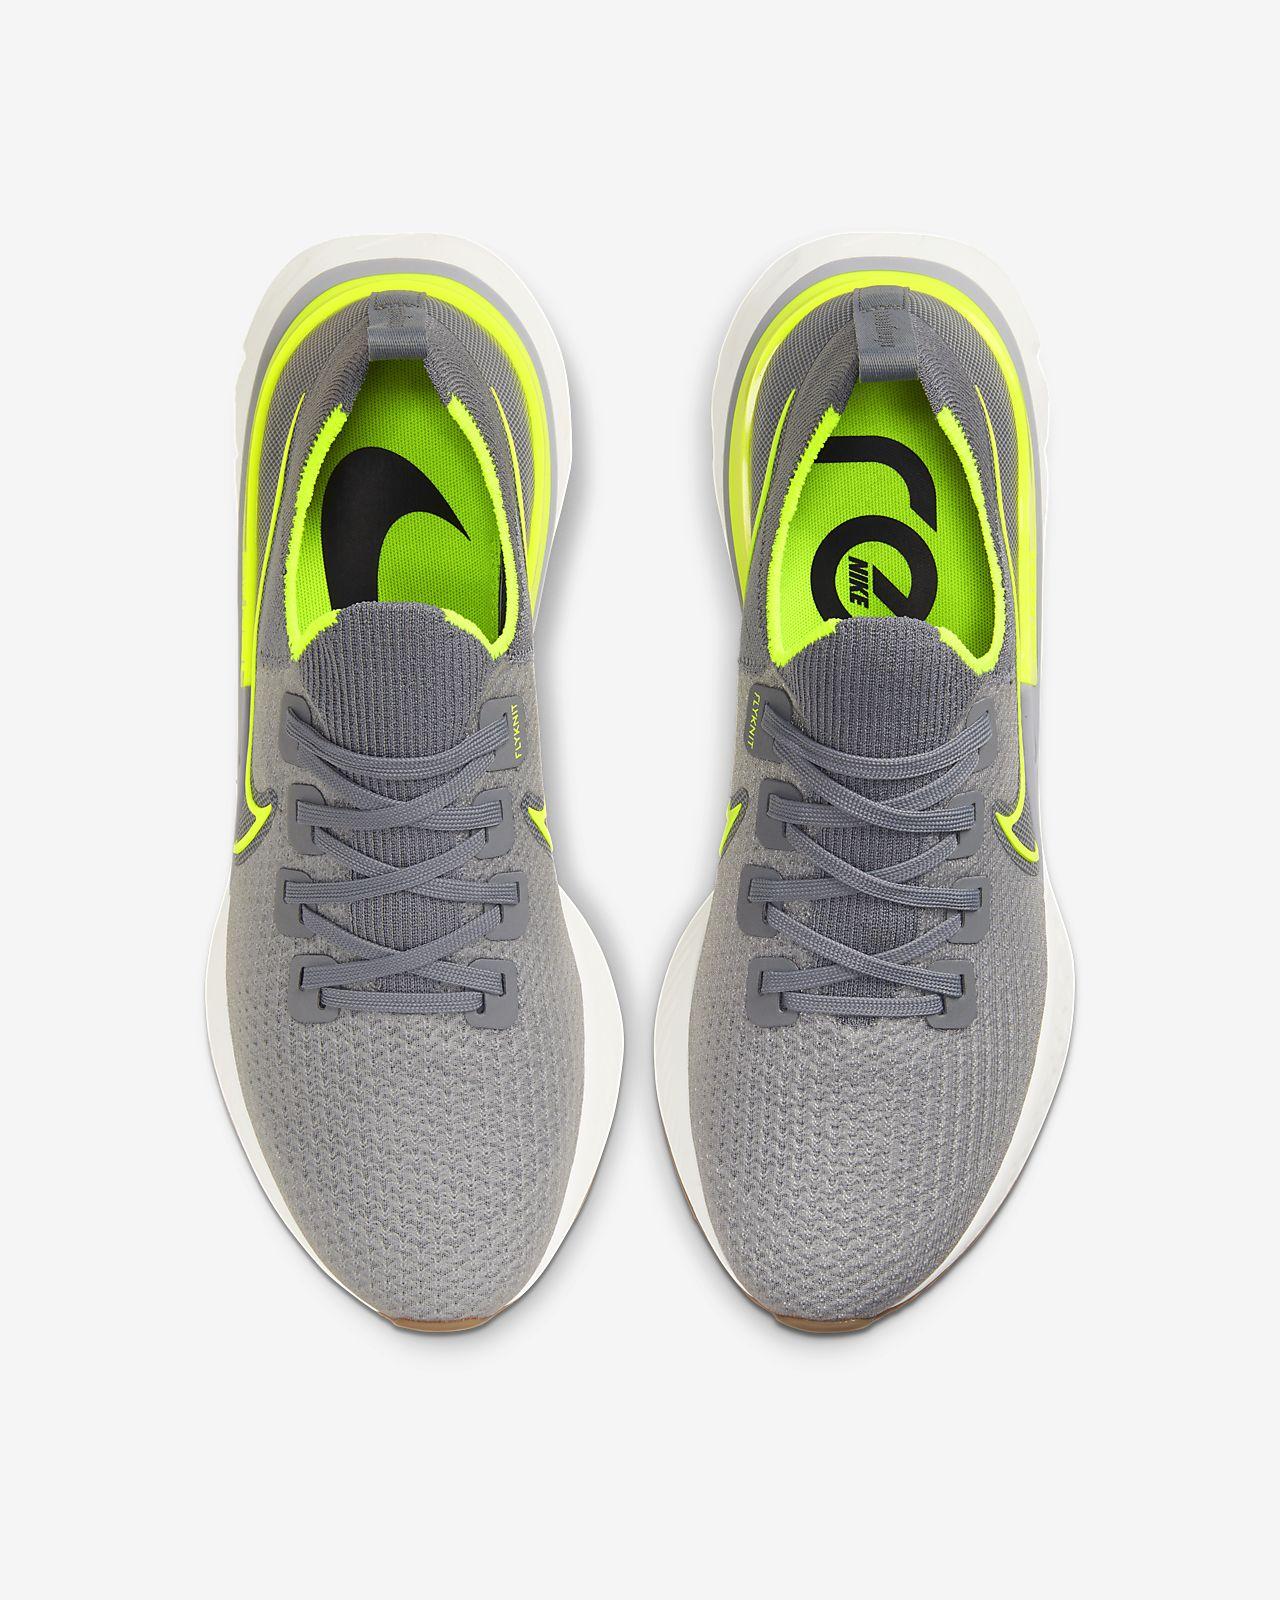 Chaussure de running Nike React Infinity Run Flyknit pour